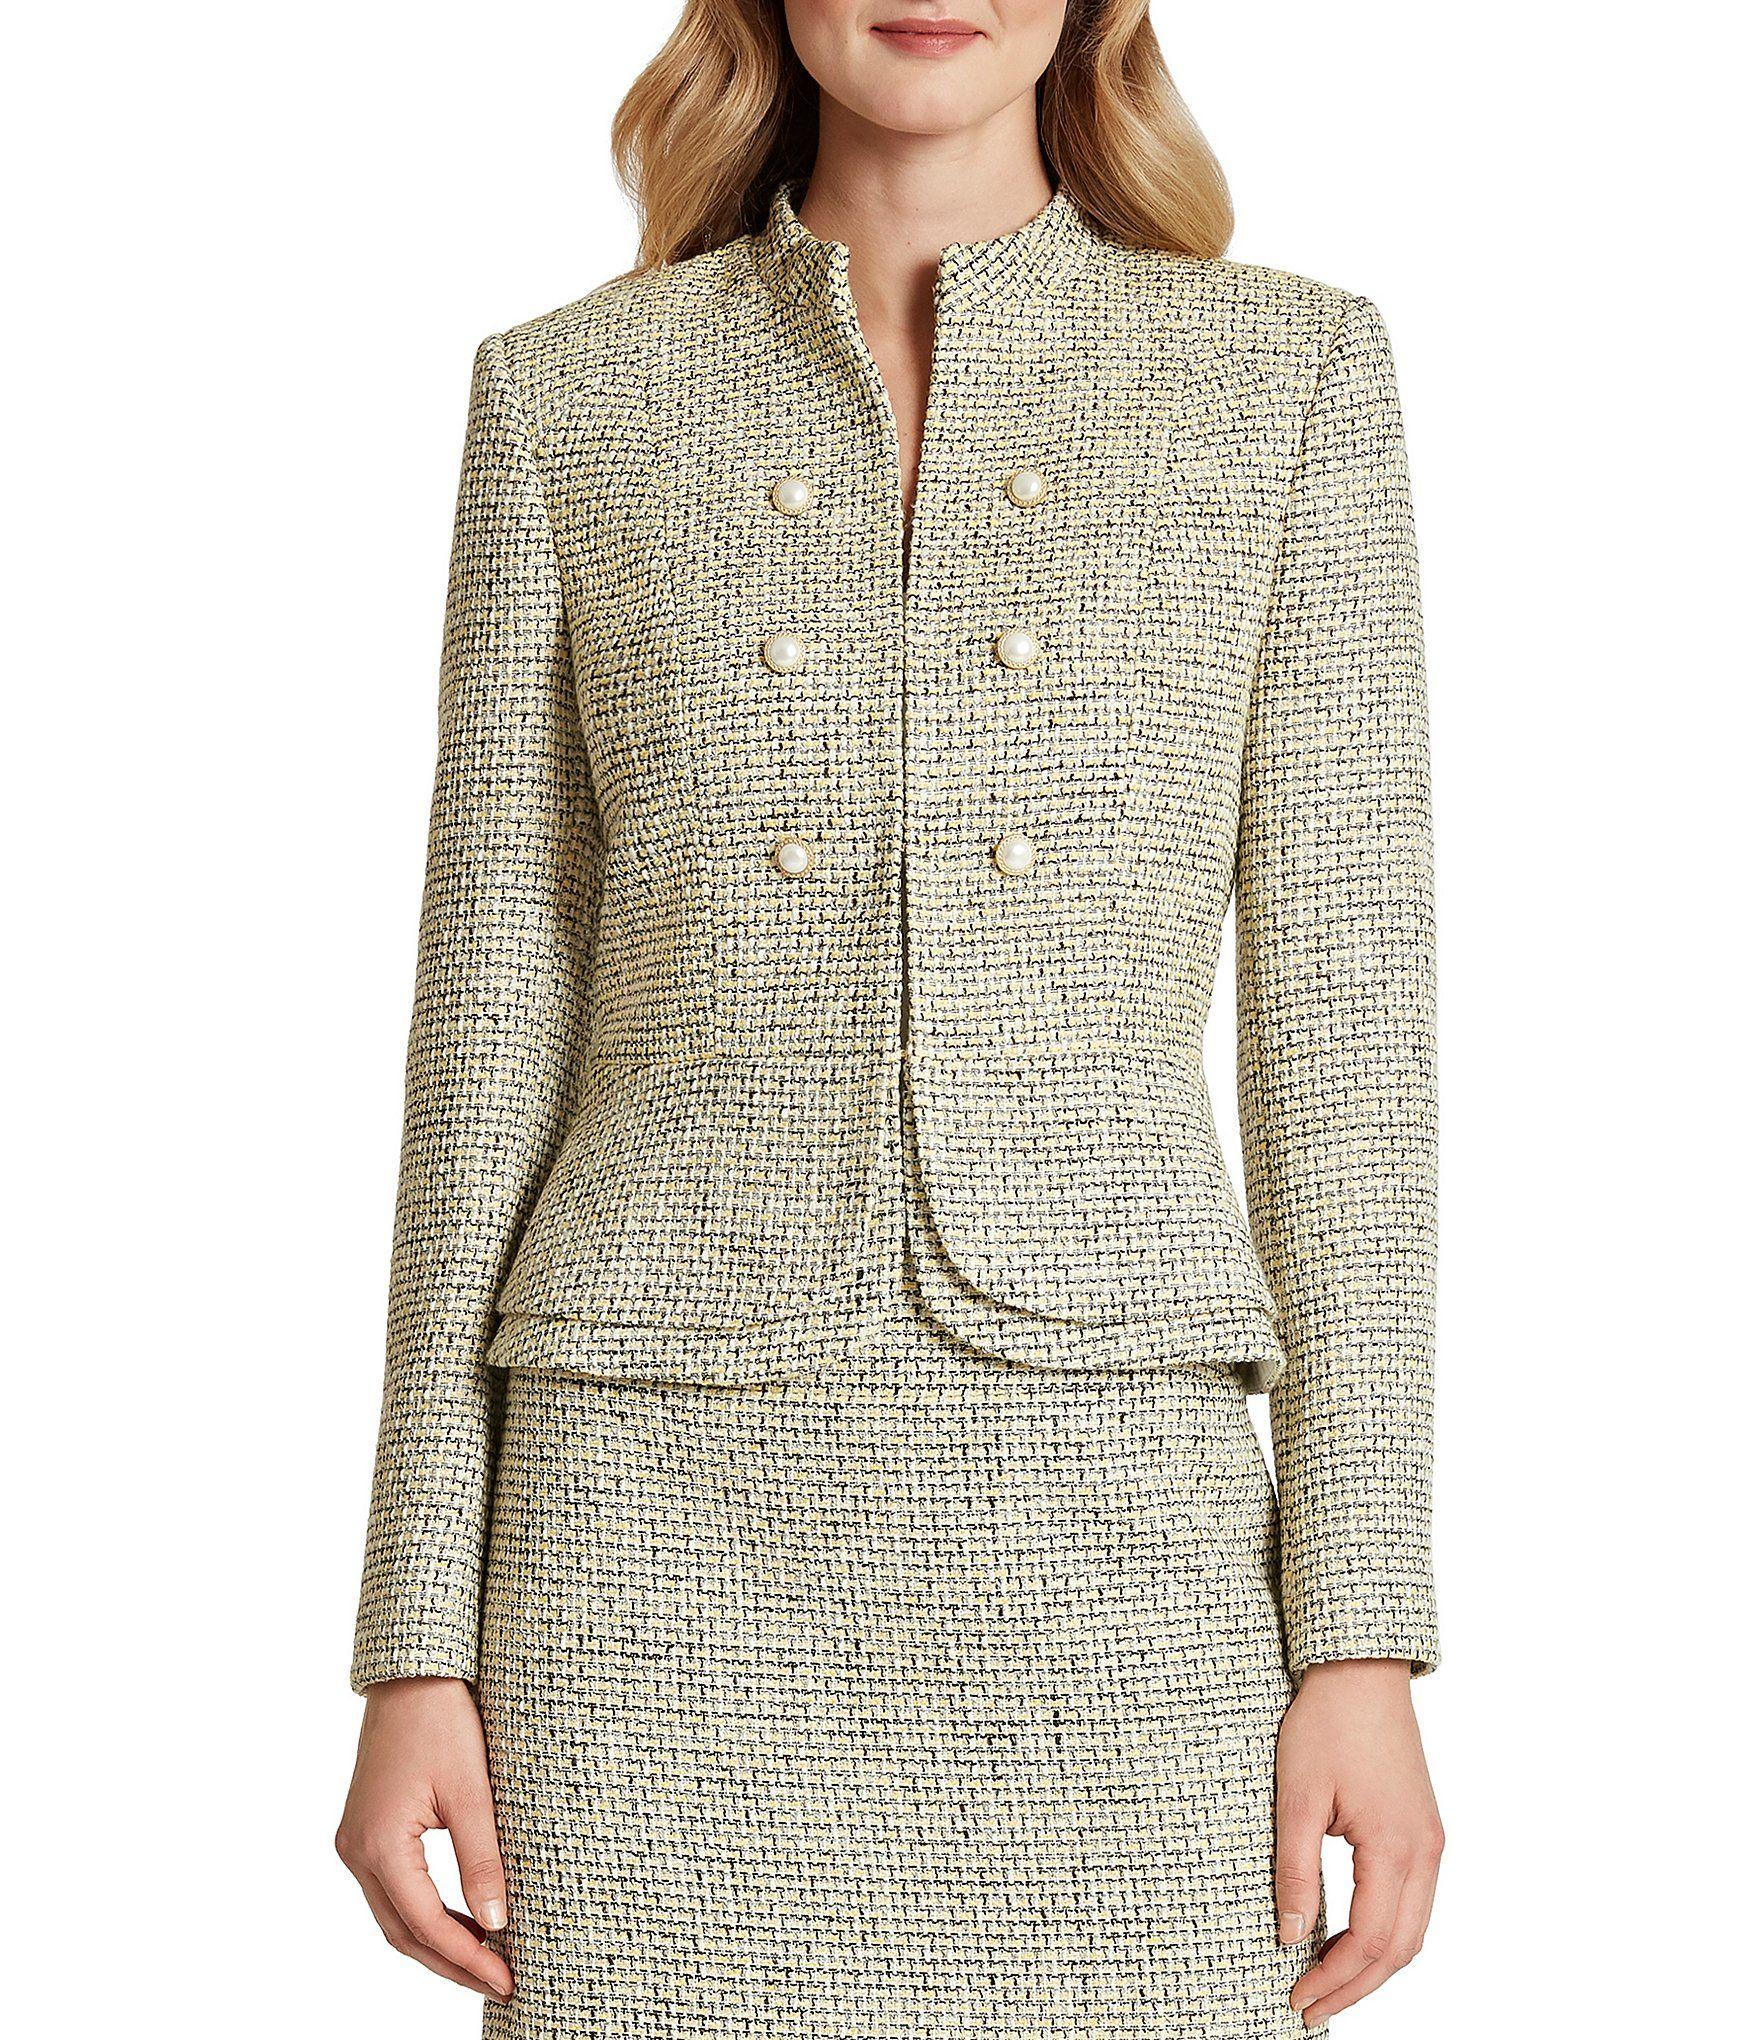 Tahari ASL Shimmer Tweed Long Sleeve Tiered Peplum Jacket